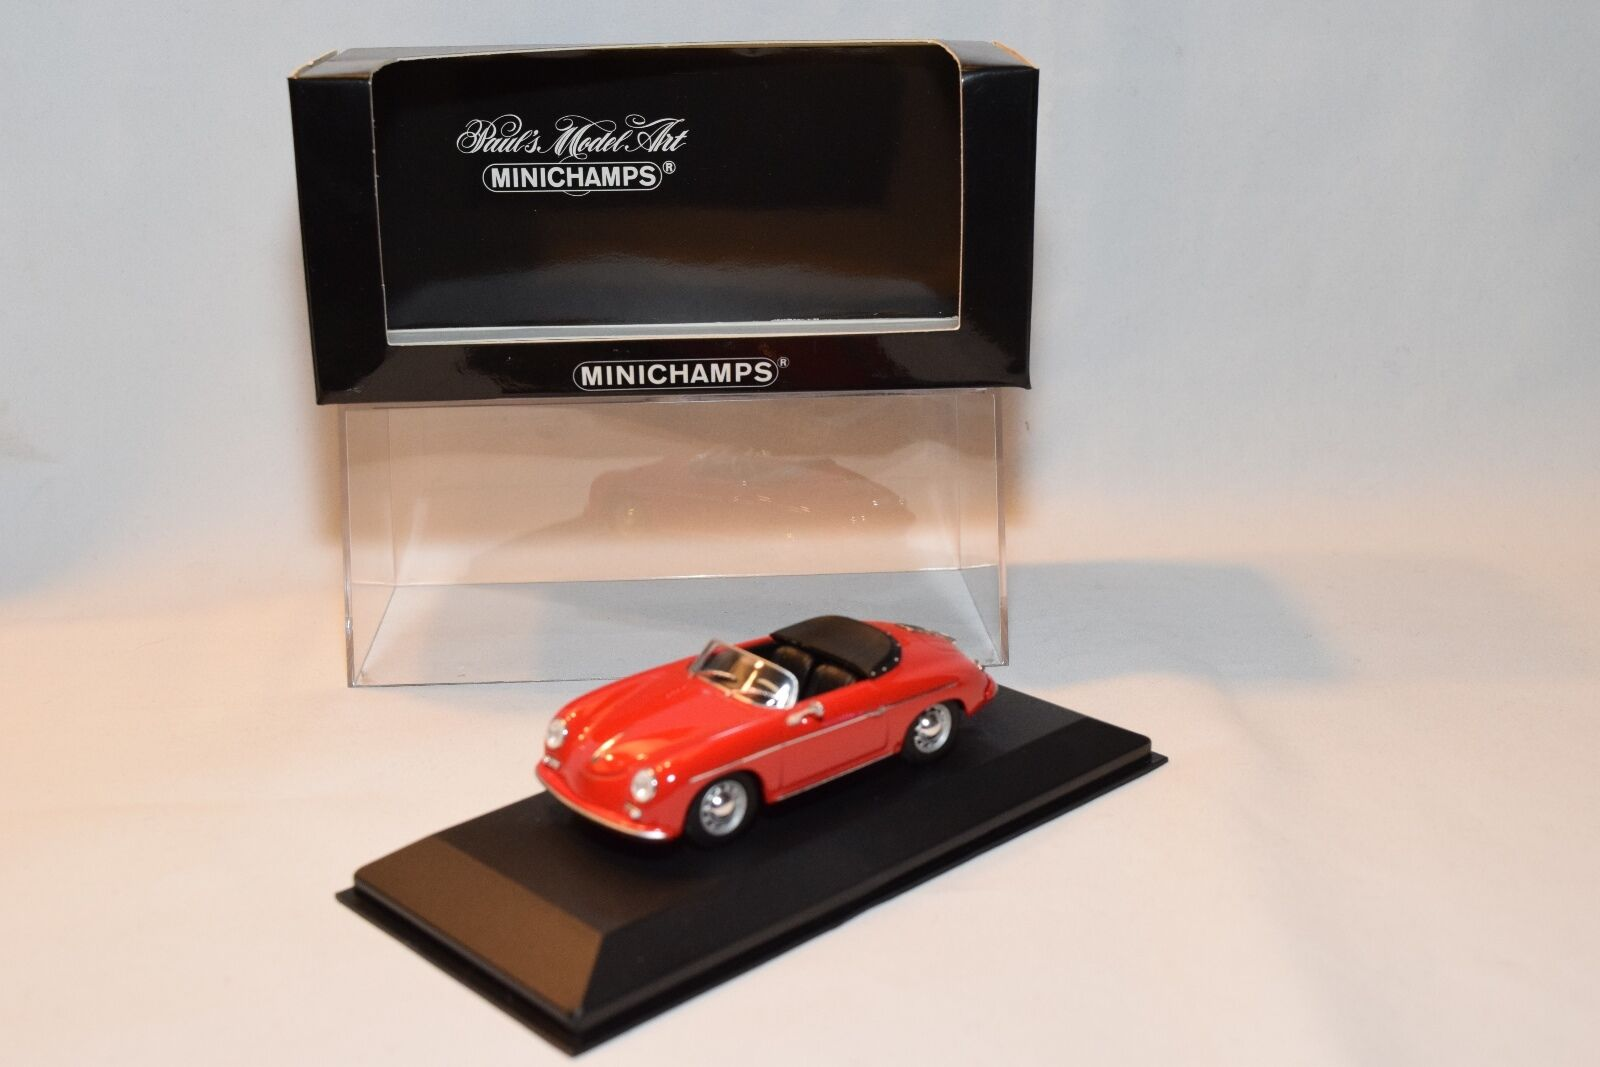 diseño único . MINICHAMPS PORSCHE 356 356 356 A SPEEDSTER SPEEDEstrella 1956 rojo MINT BOXED  precio razonable